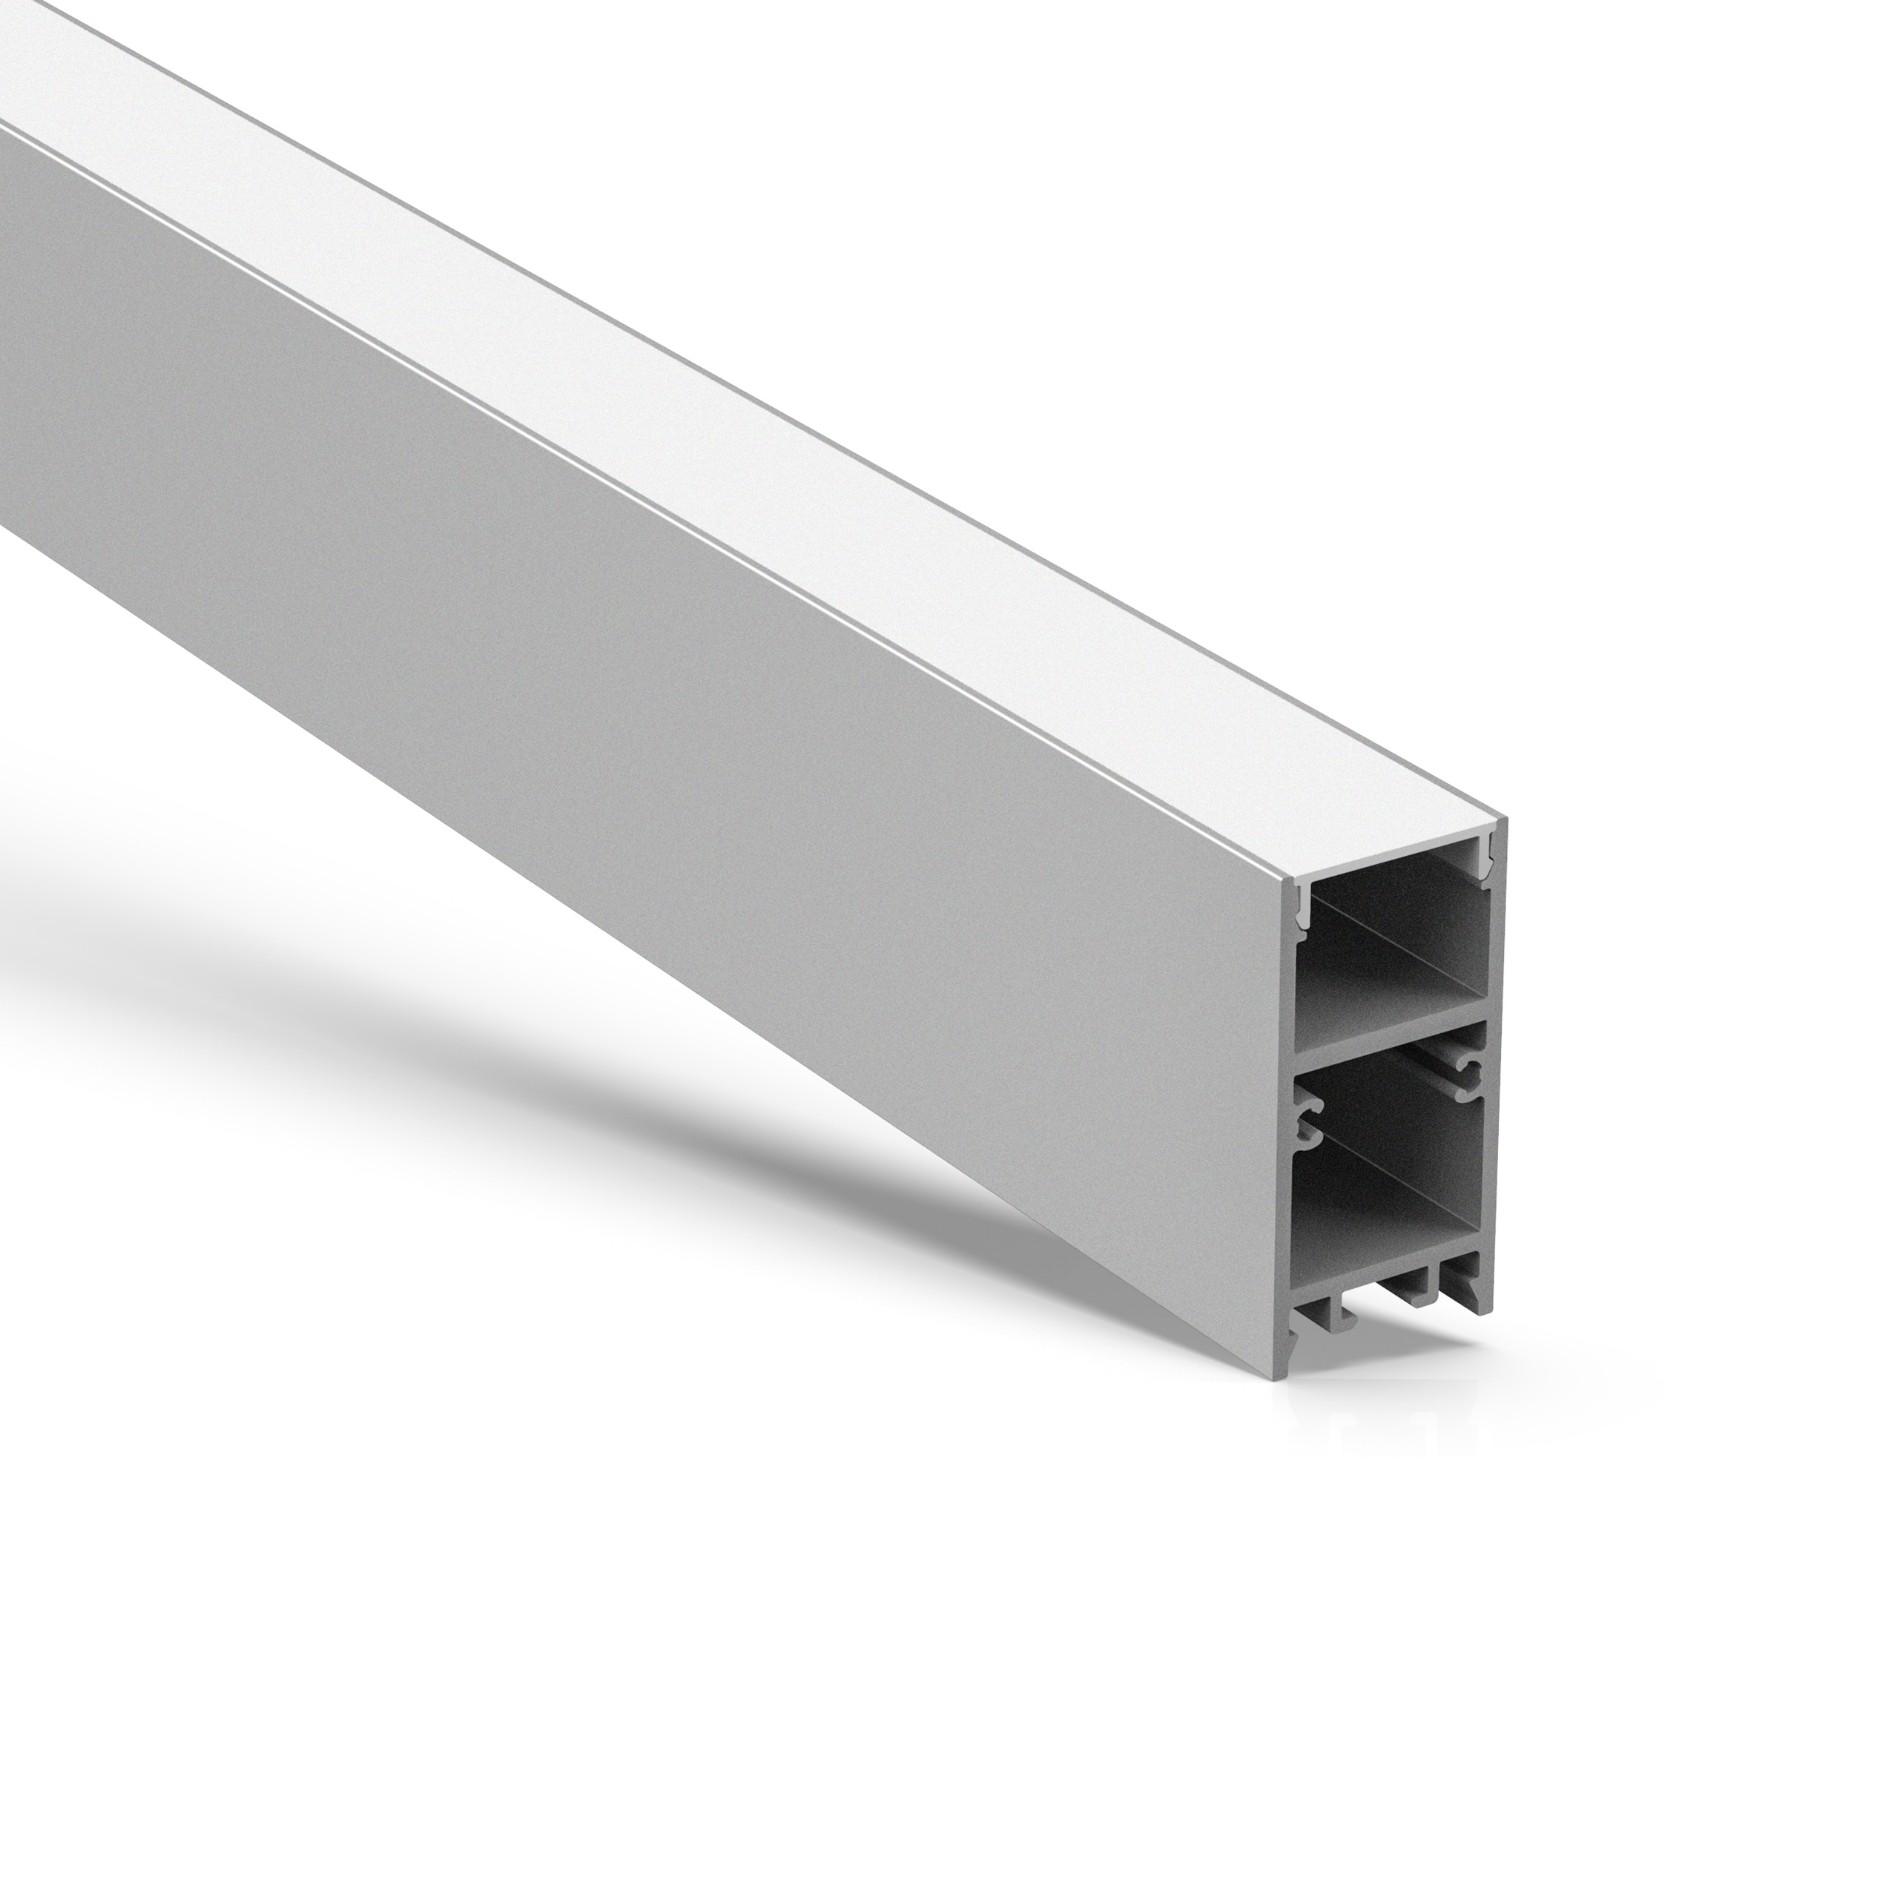 Perfil de aluminio LED de montaje en superficie U20 H 20x40mm